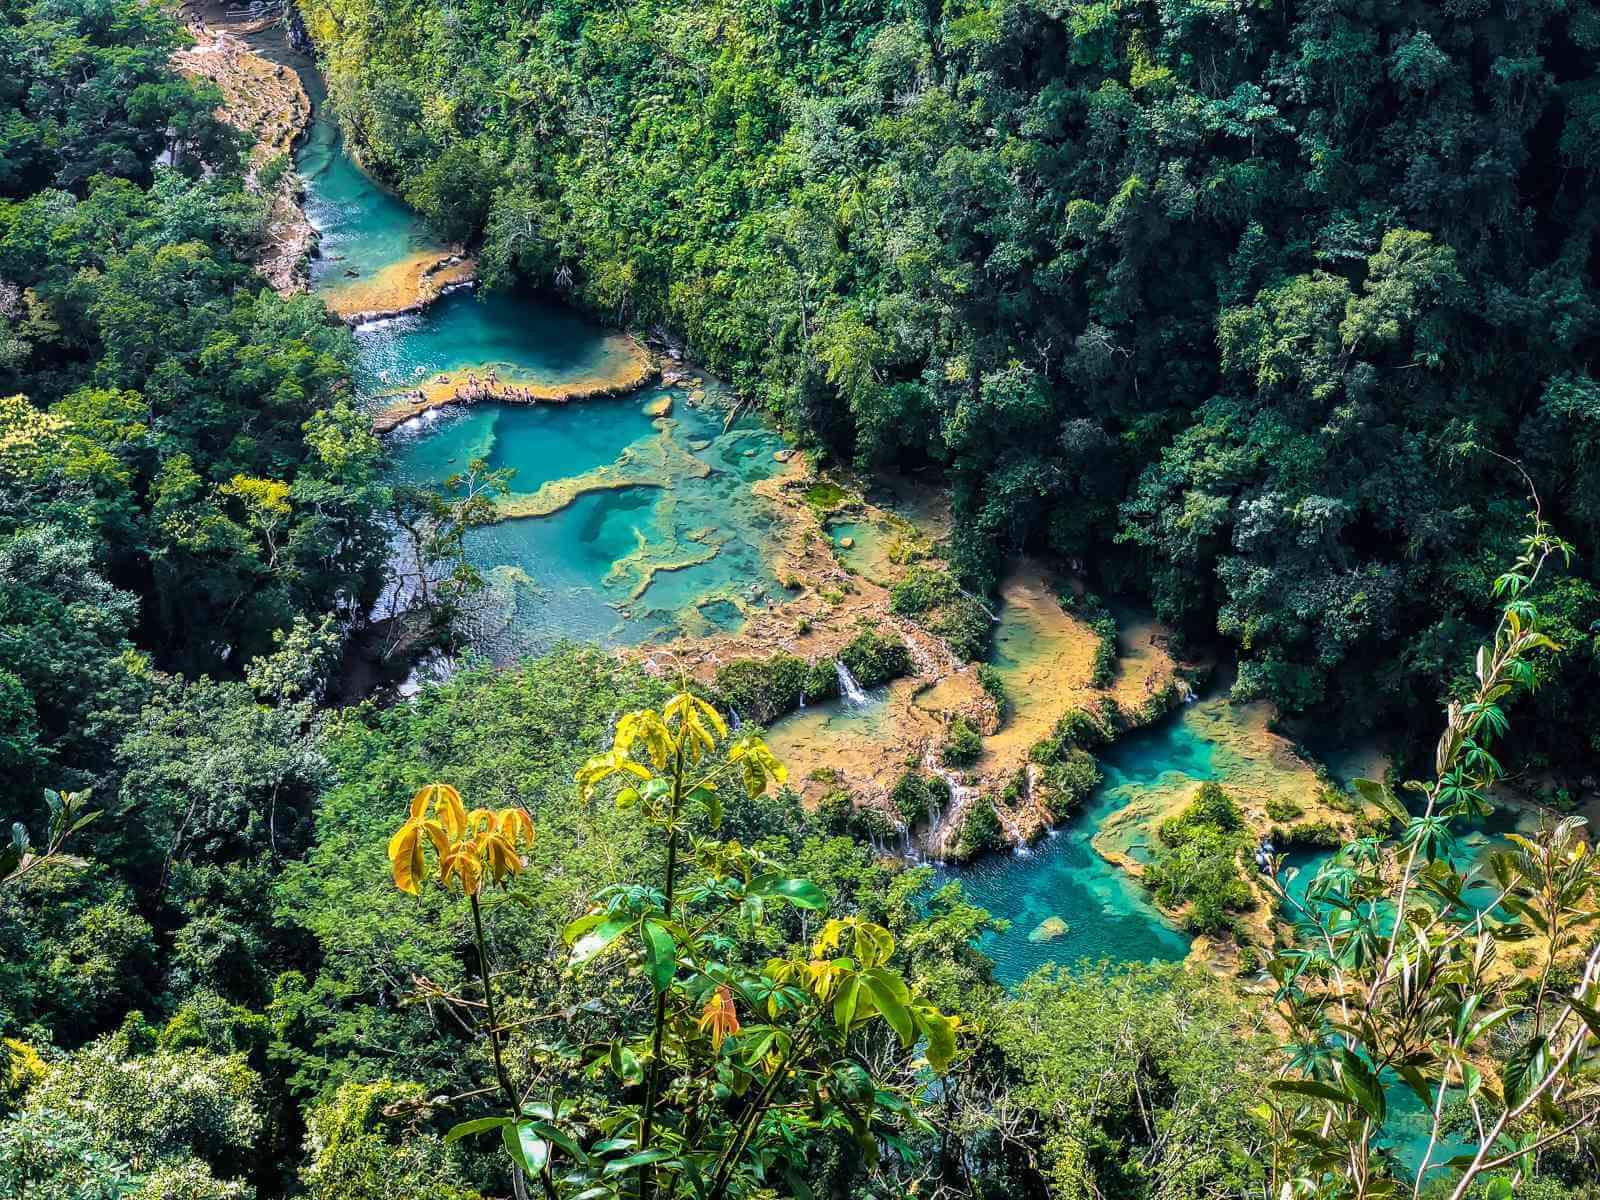 Semuc Champey - Azuurblauwe waterpoelen in de jungle